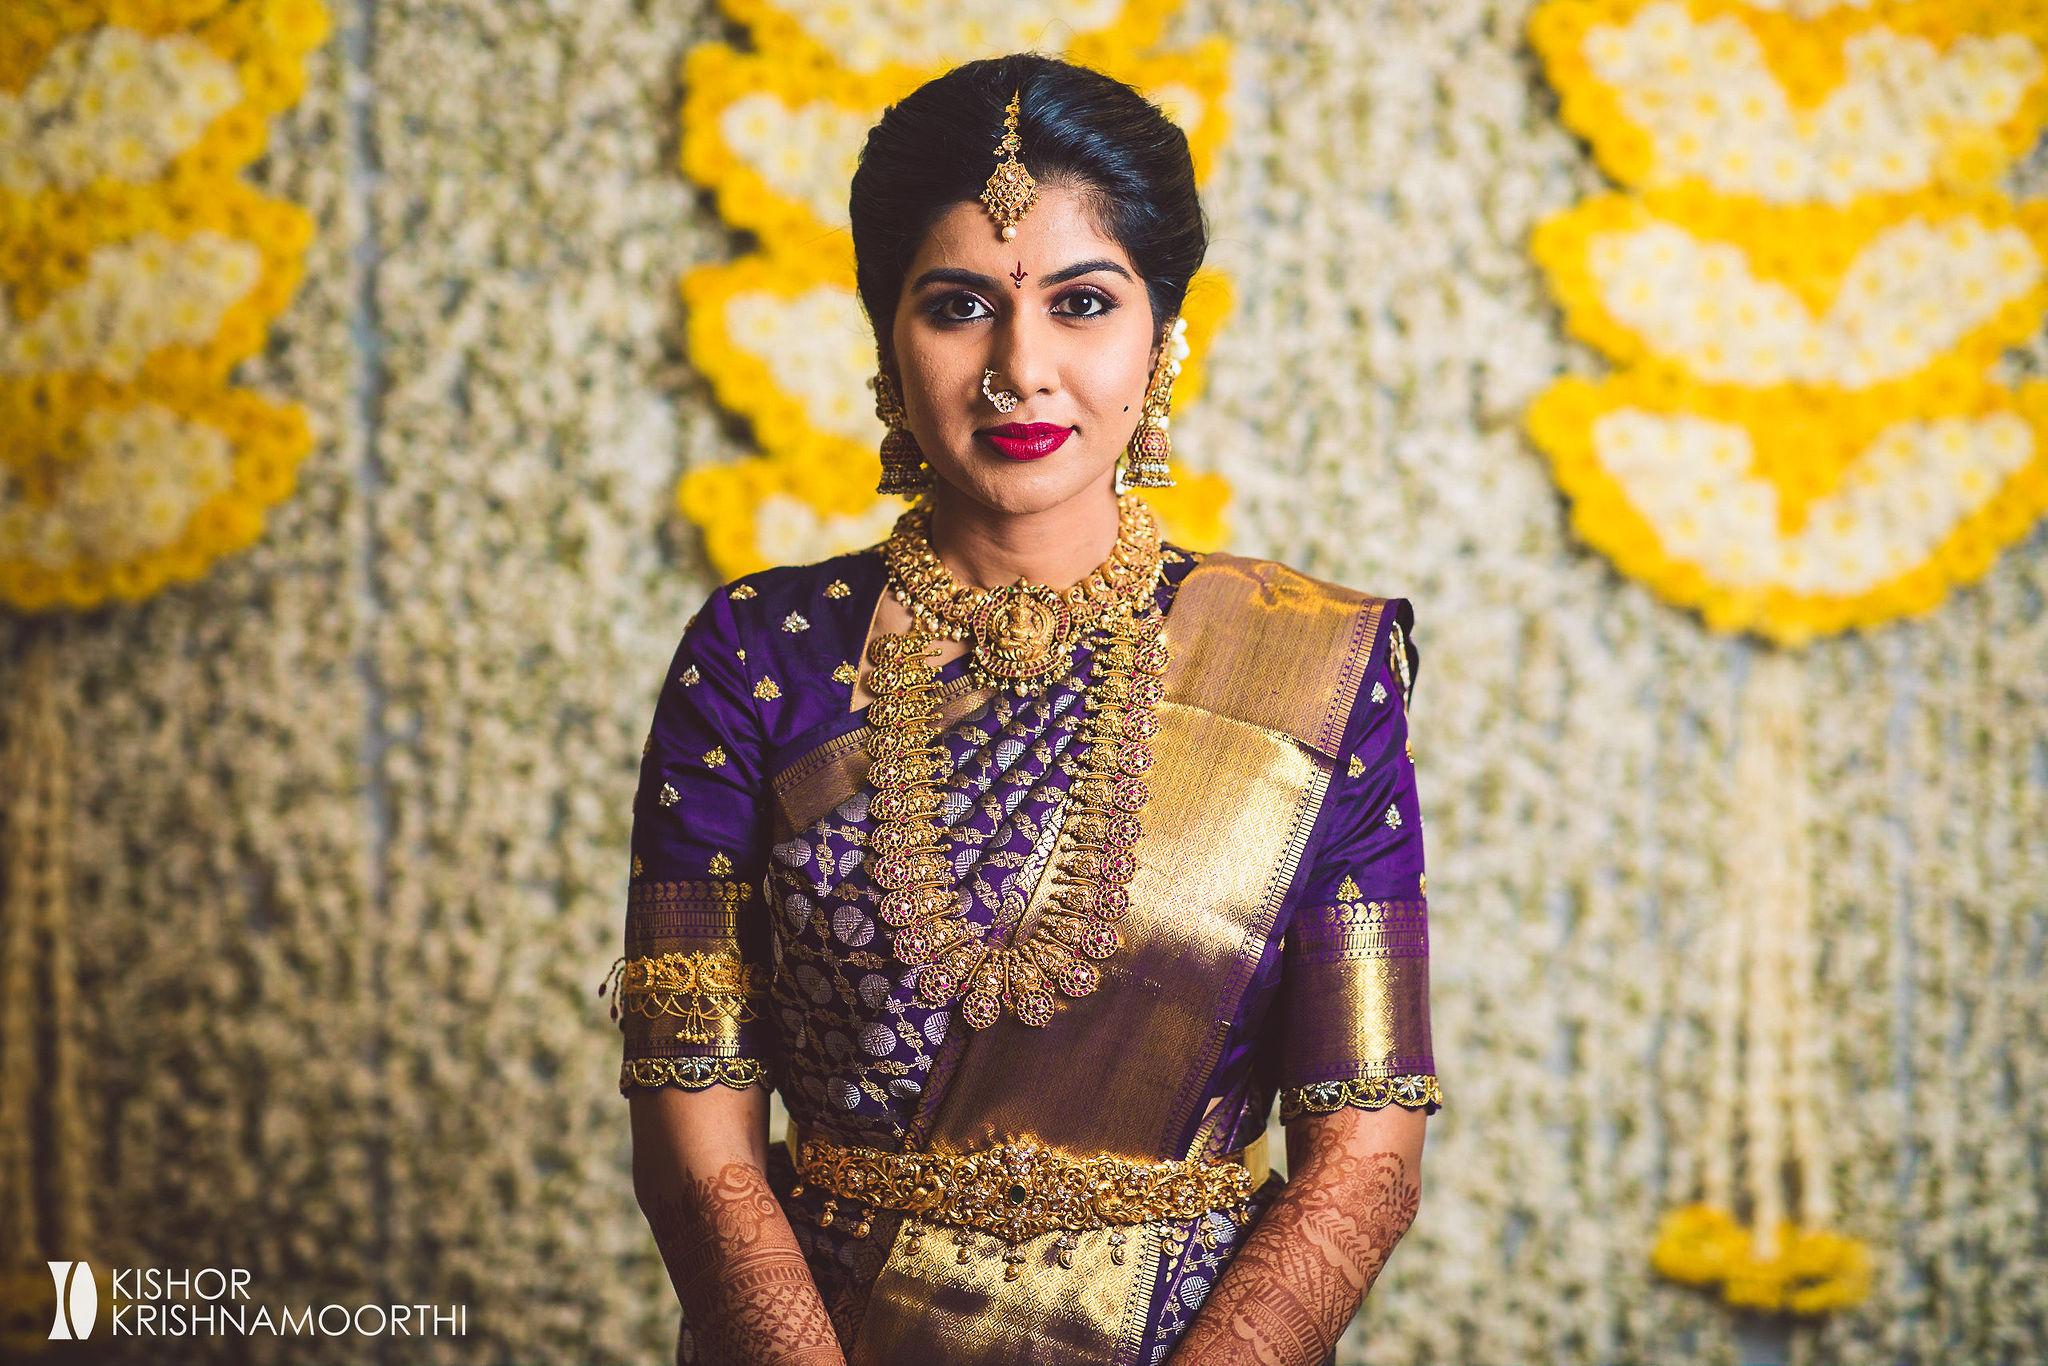 pellikuthuru-wedding-day-bridal-look-bride-portraits-beautiful-kishorkrishnamoorthi-happy-vibe-elegant